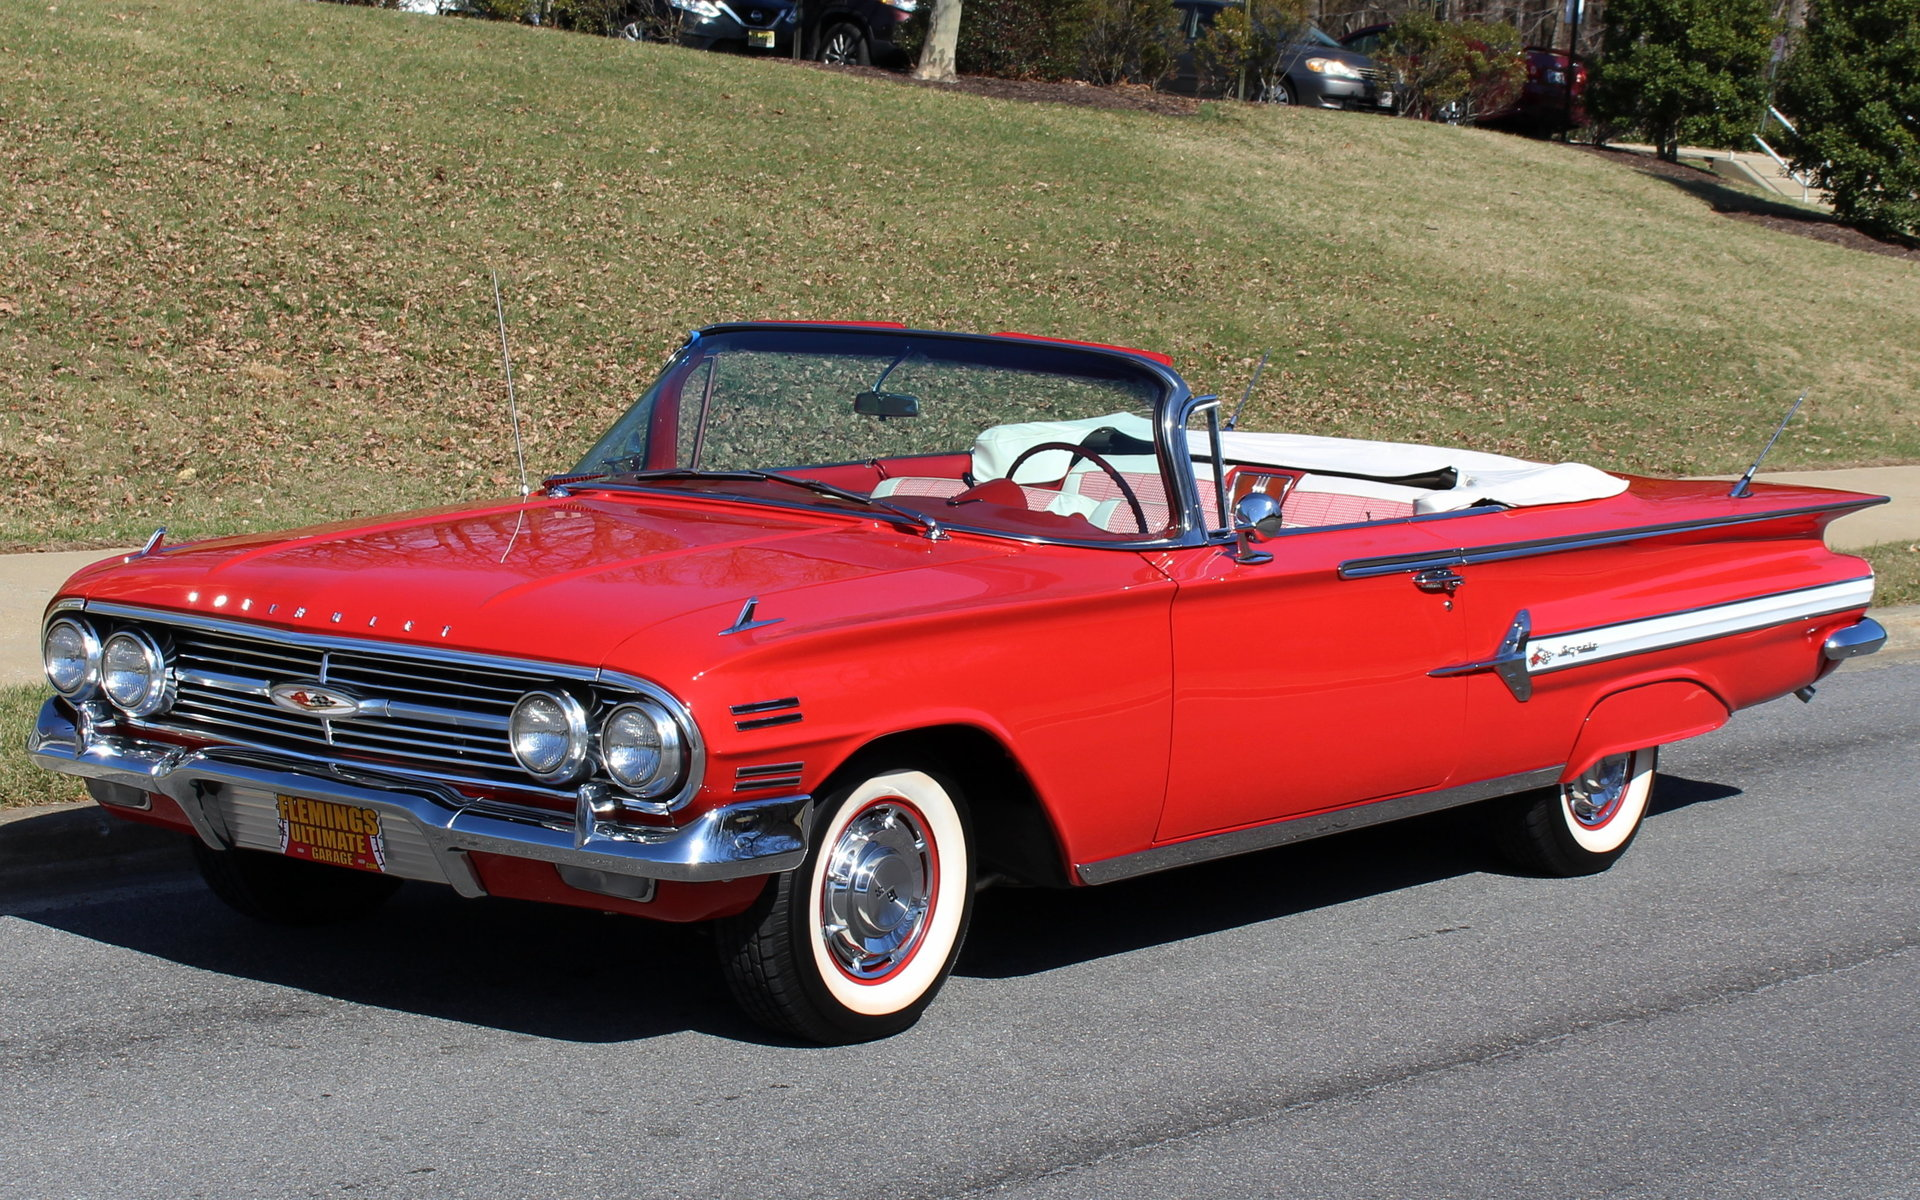 1960 chevrolet impala convertible for sale 80342 mcg. Black Bedroom Furniture Sets. Home Design Ideas